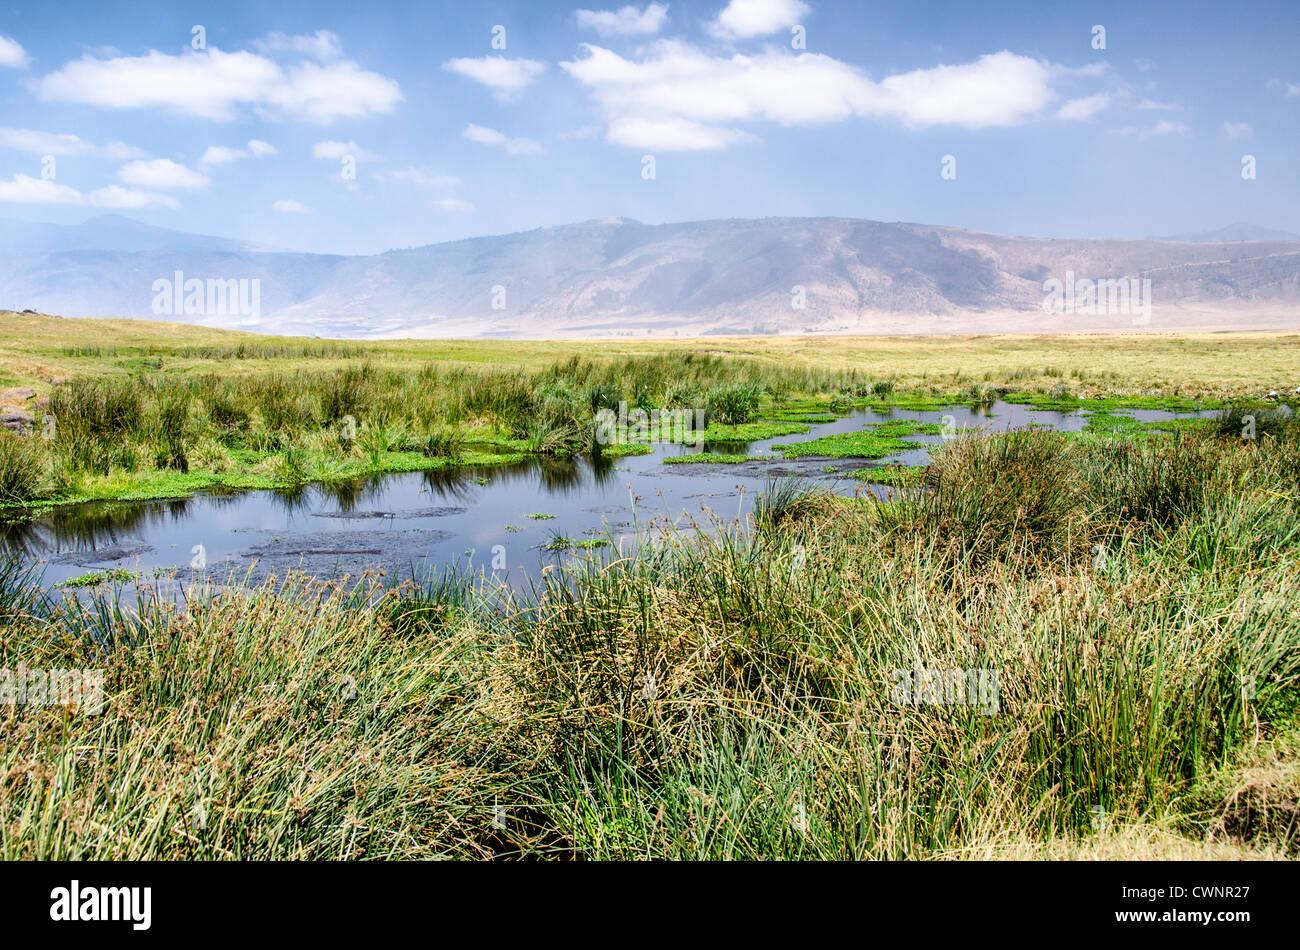 NGORONGORO CONSERVATIONAL AREA, Tanzania - A small watering hole at Ngorongoro Crater in the Ngorongoro Conservation - Stock Image